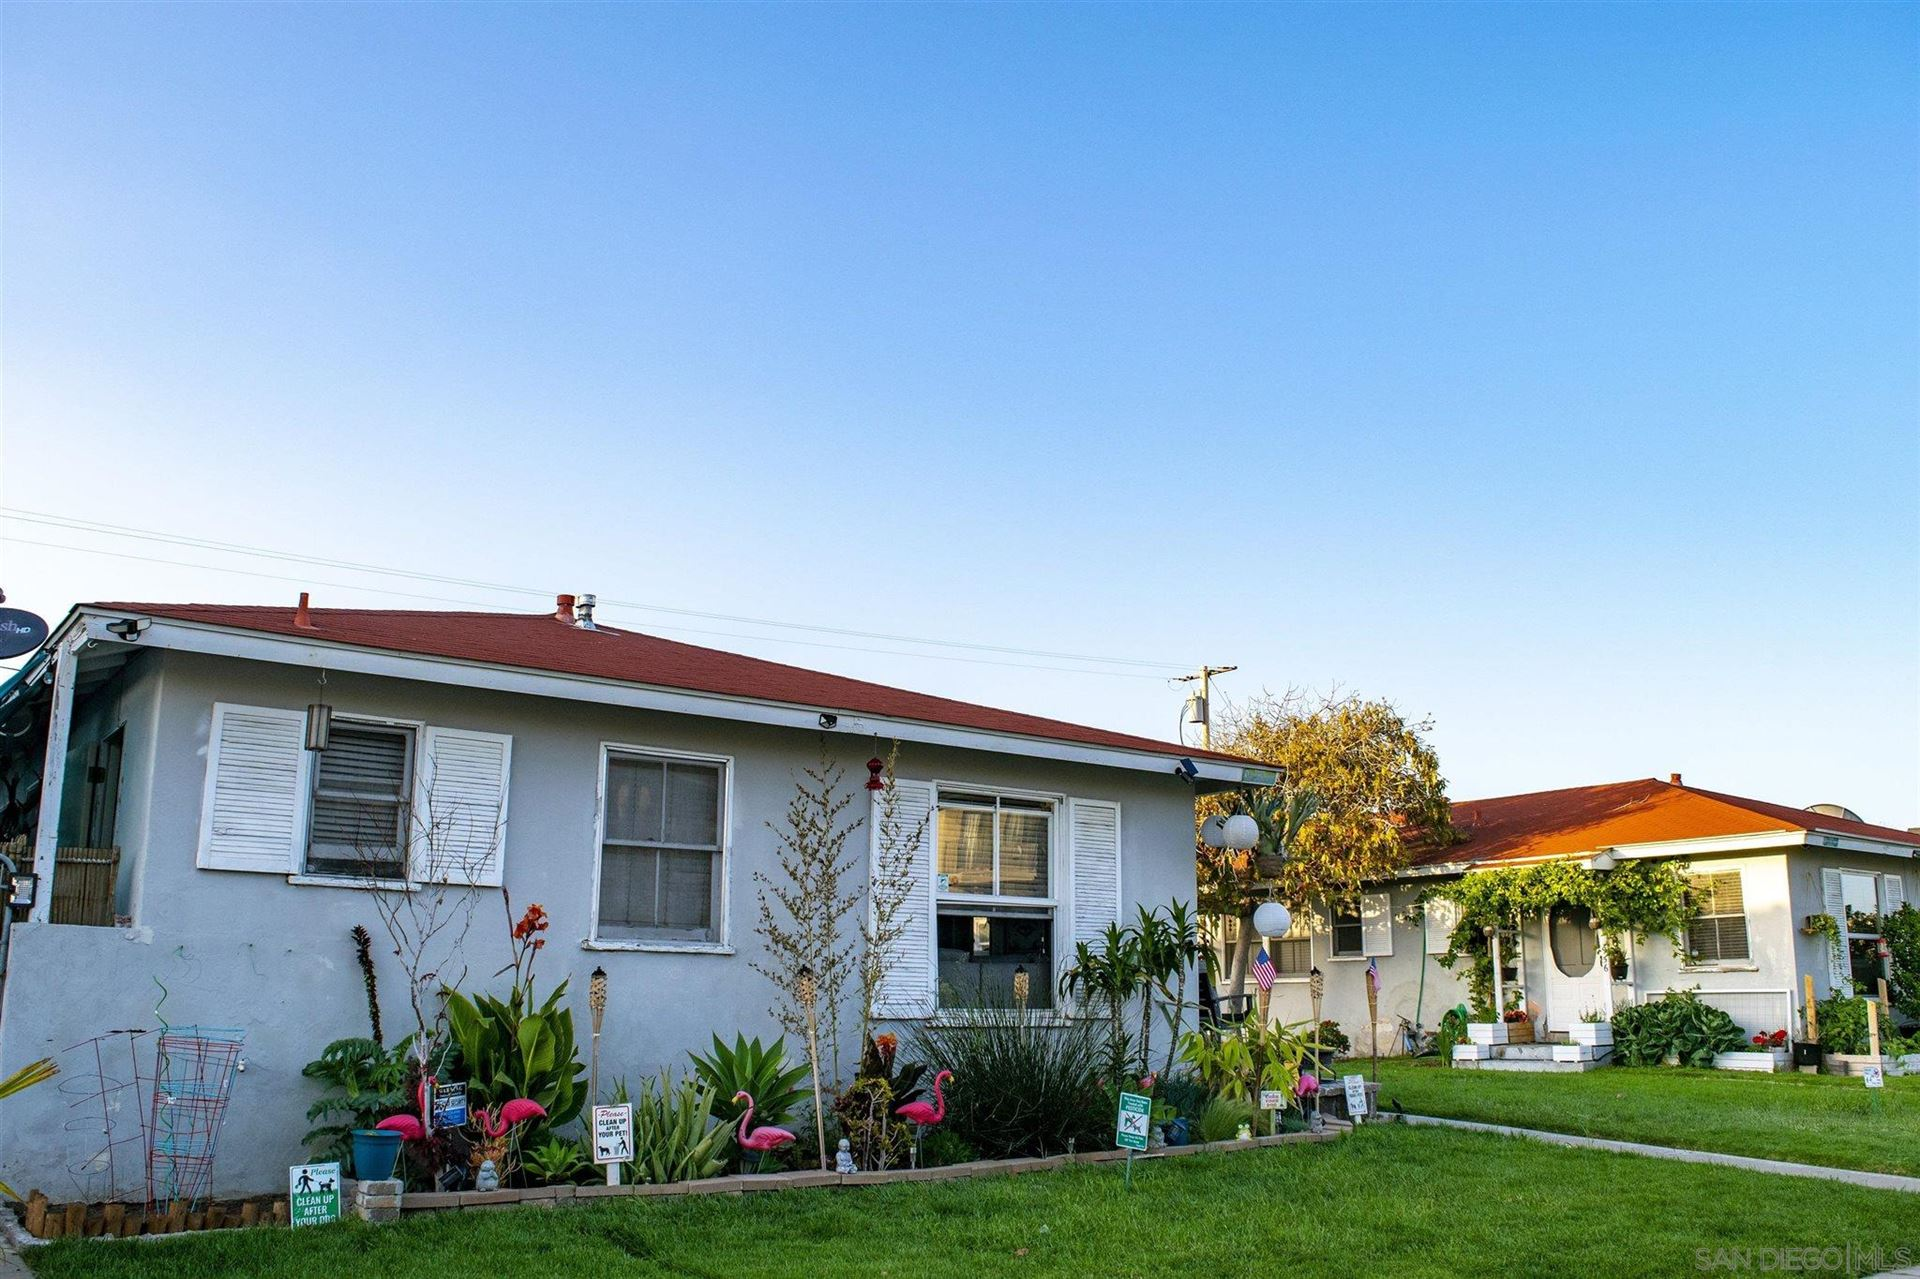 Photo of 942 Felspar St., San Diego, CA 92109 (MLS # 210016249)